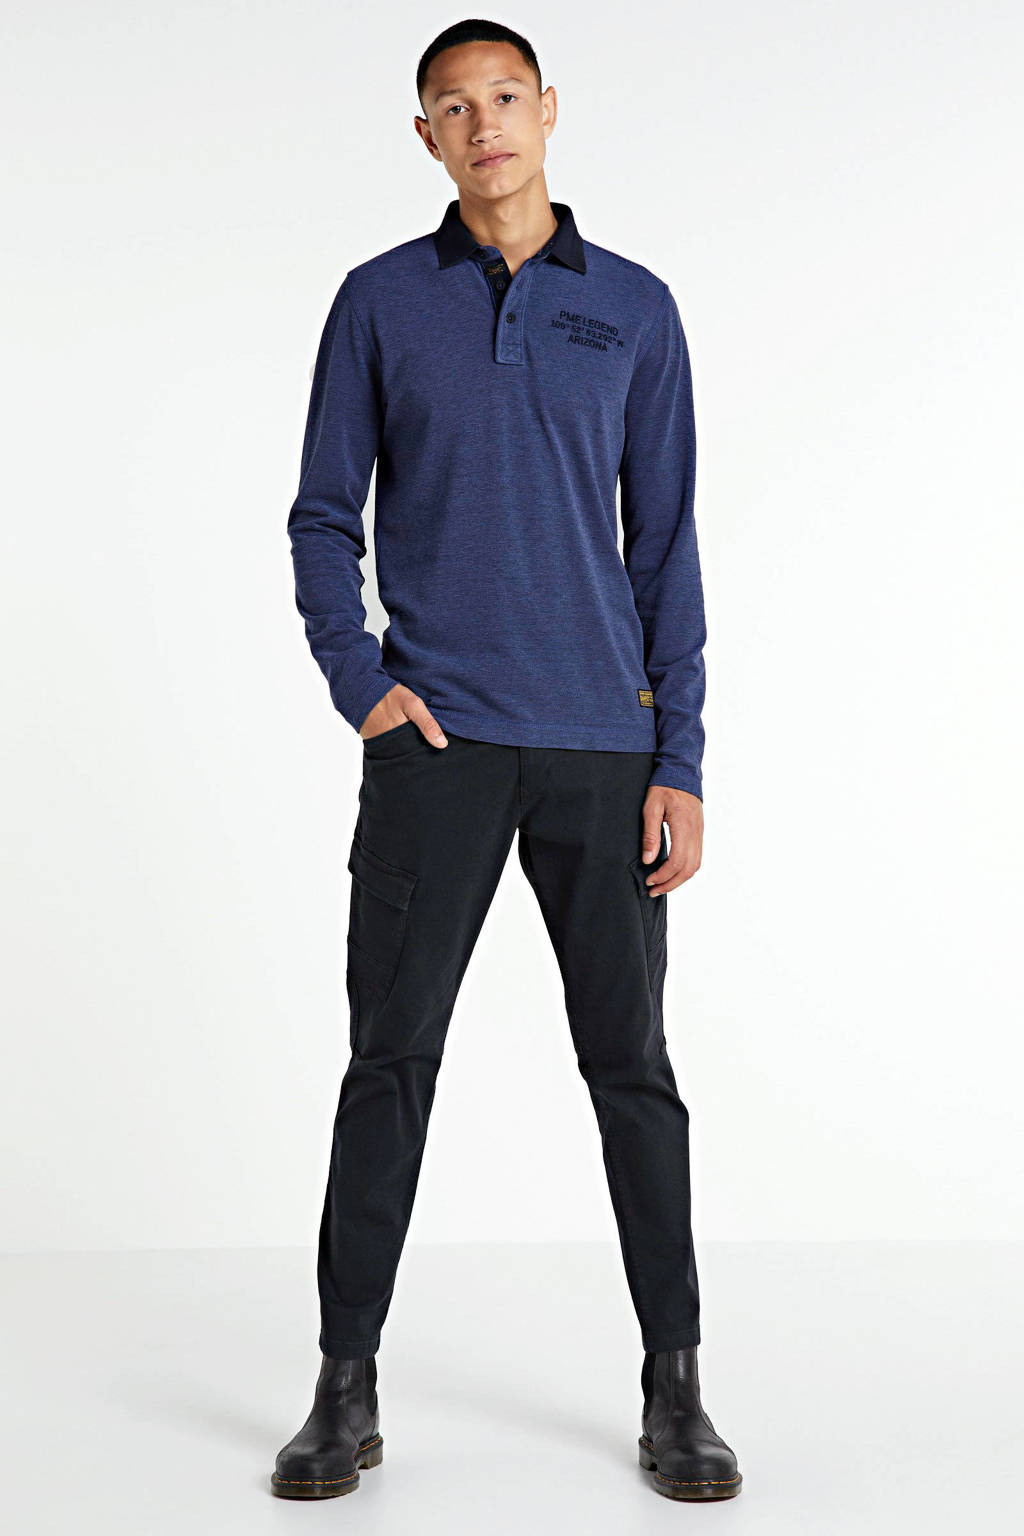 ESPRIT Men Casual regular fit cargobroek donkerblauw, Donkerblauw